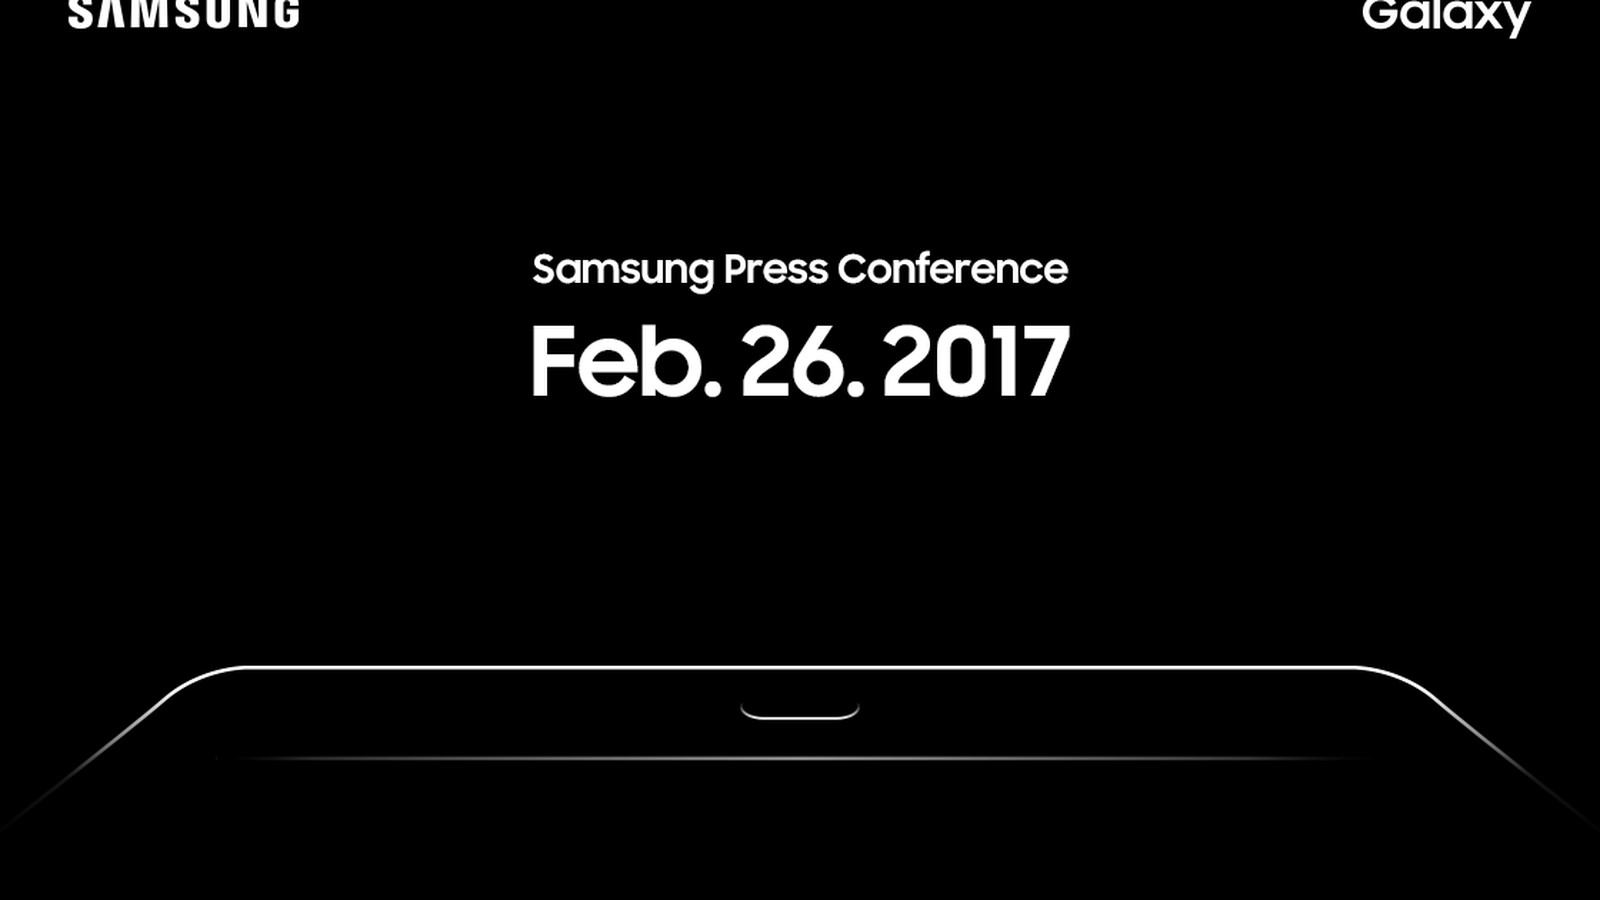 Samsung Teases Tablet for Mobile World Congress Reveal